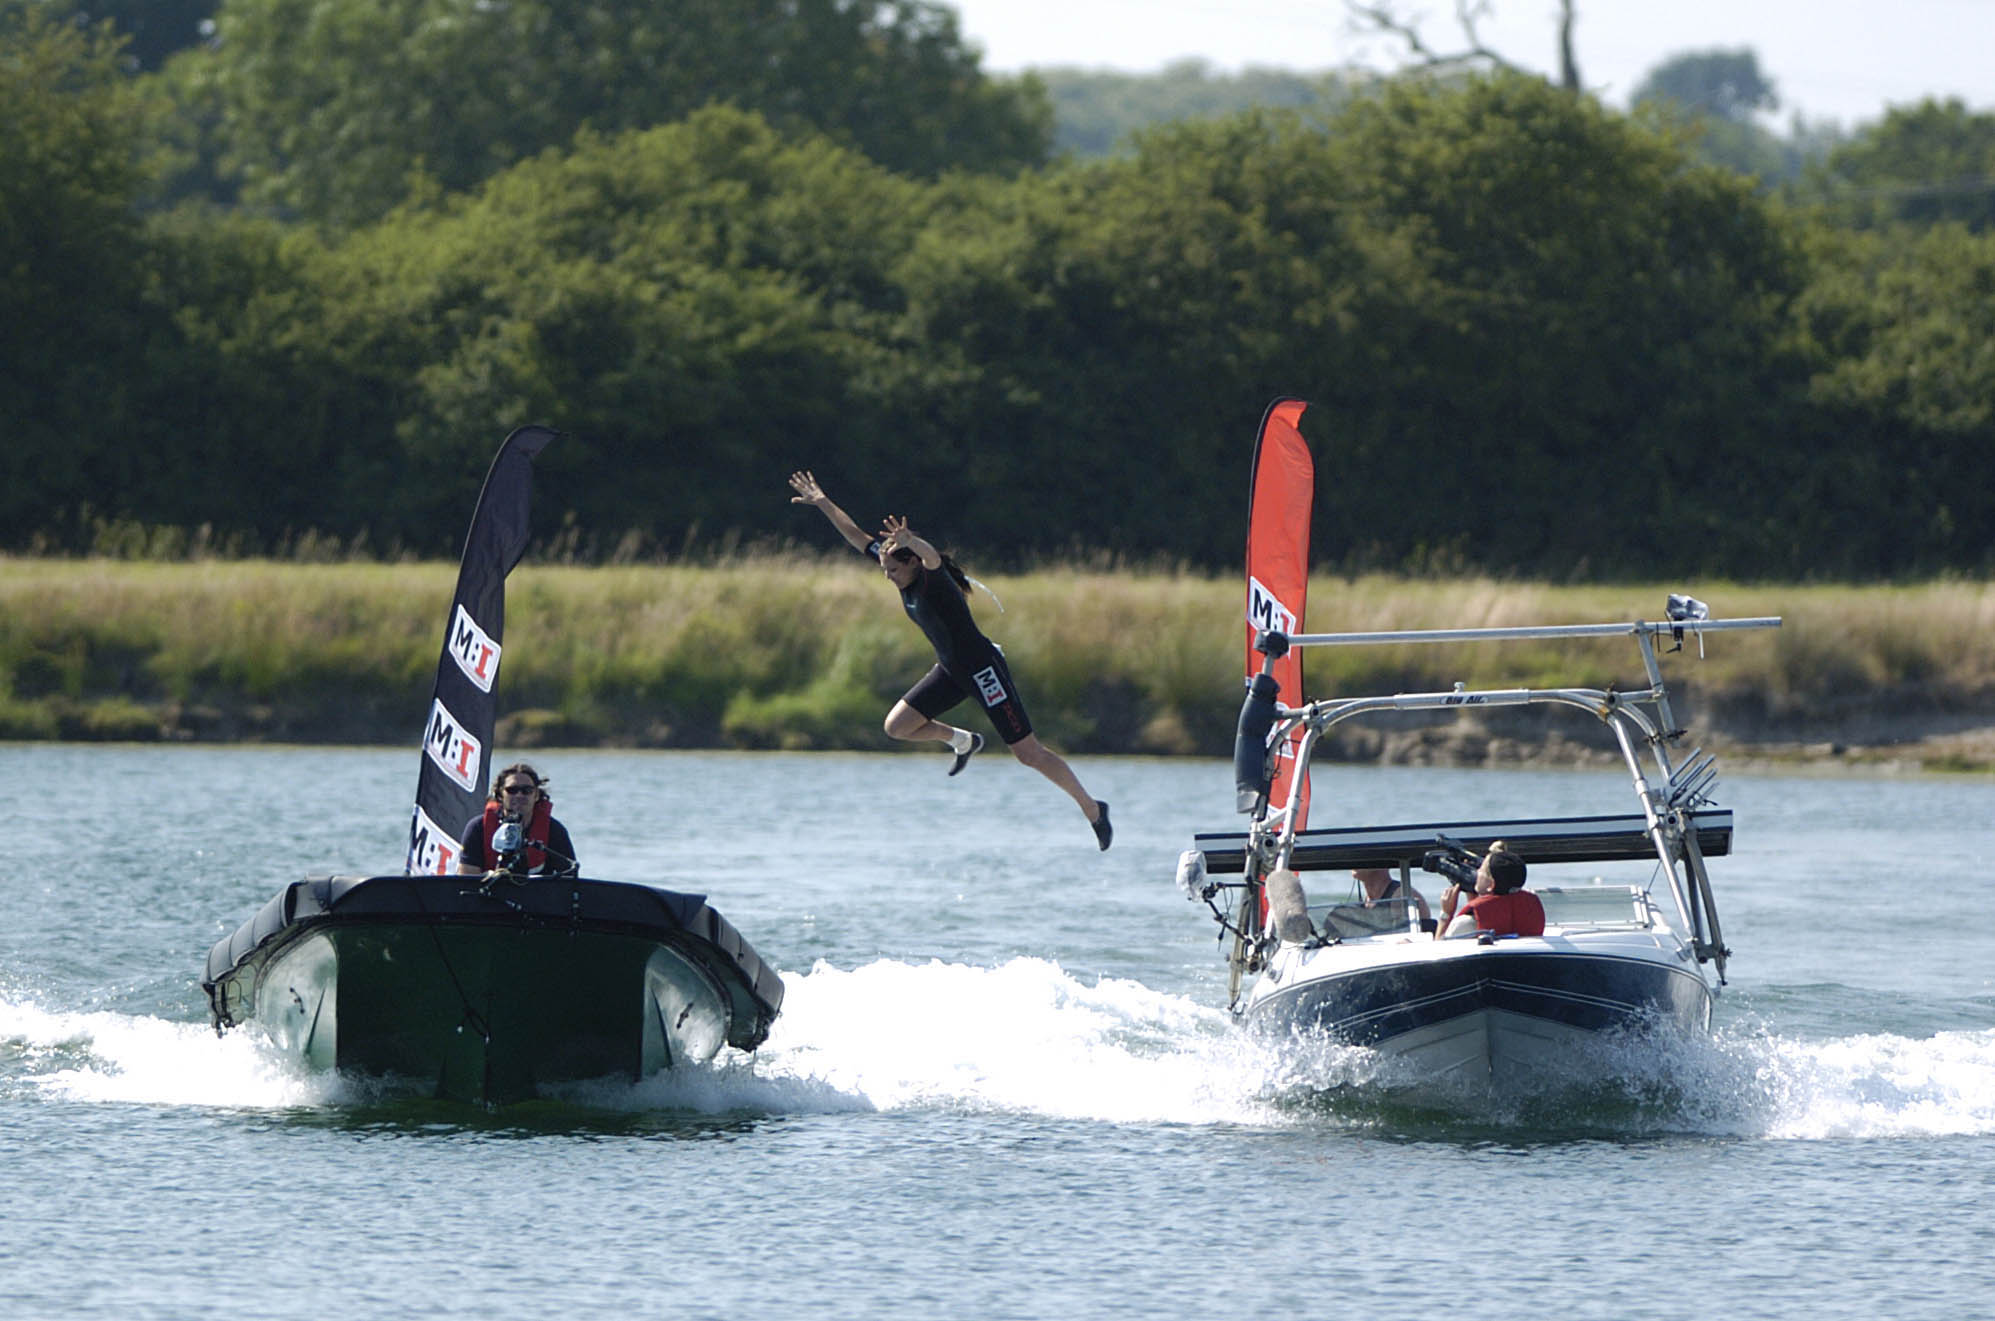 Marc Cass - speedboat to speedboat transfer